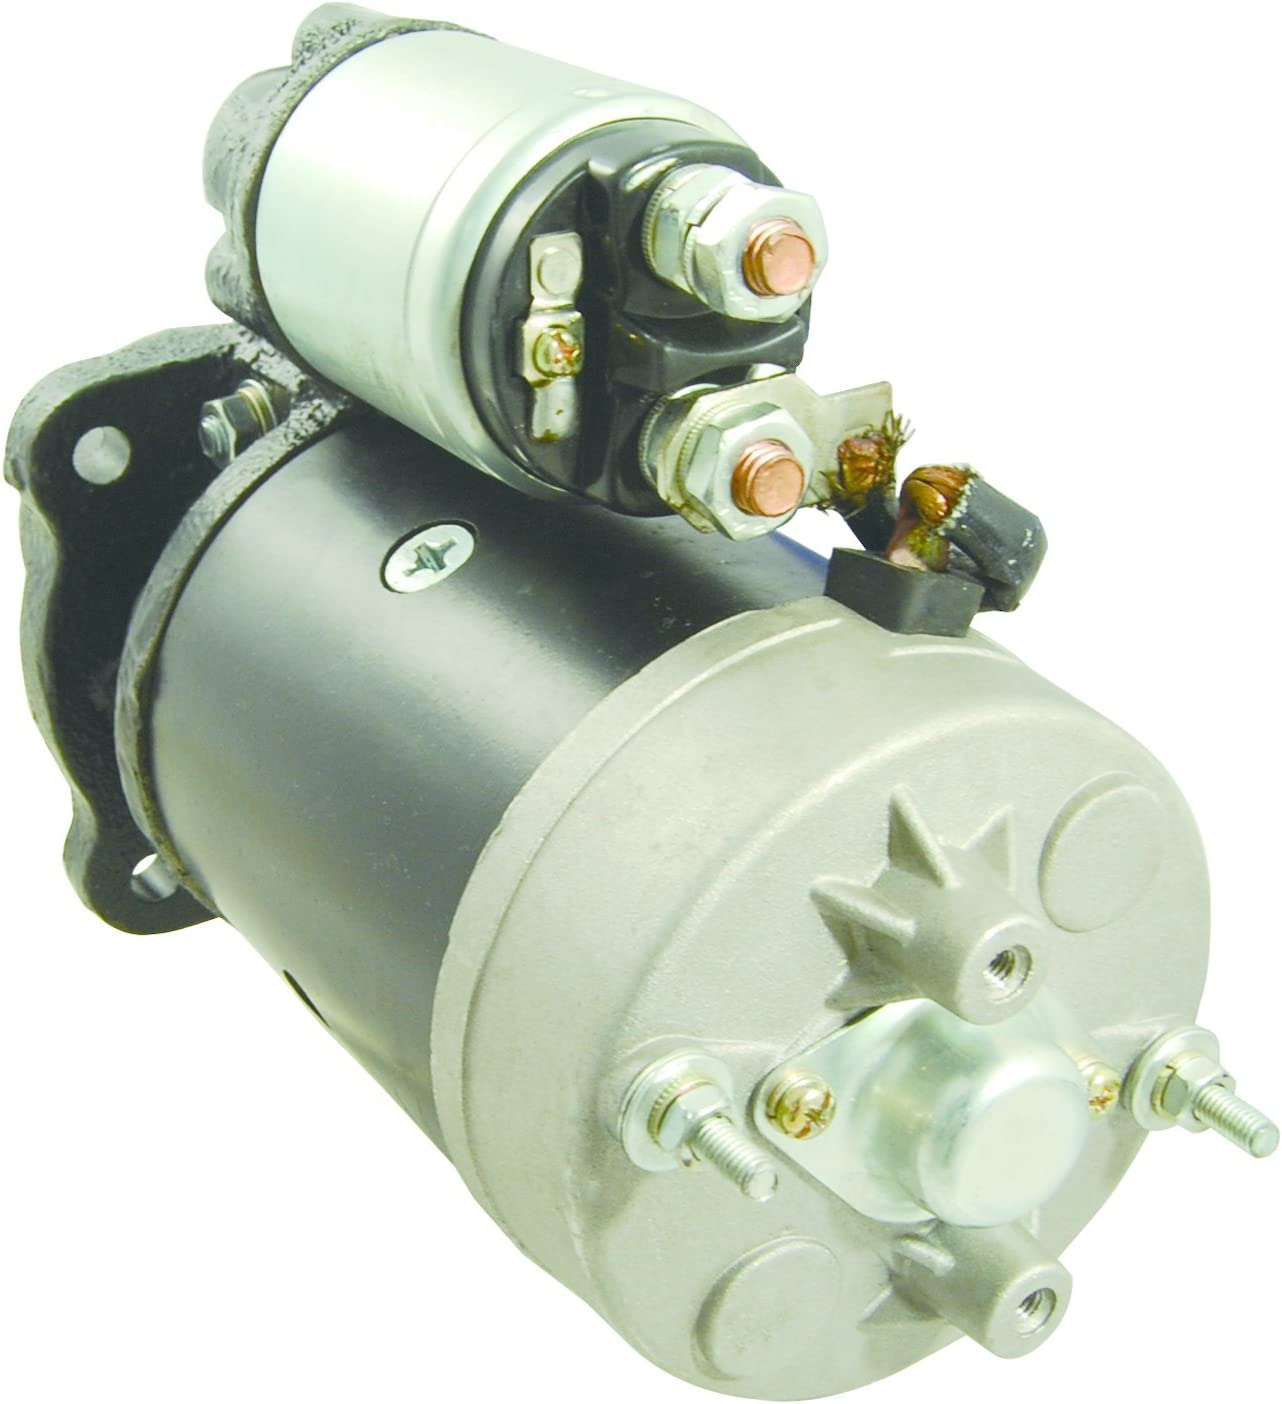 Starter Fits john Deere Power Units CD4039DF Genset Code 3008 3009 3016